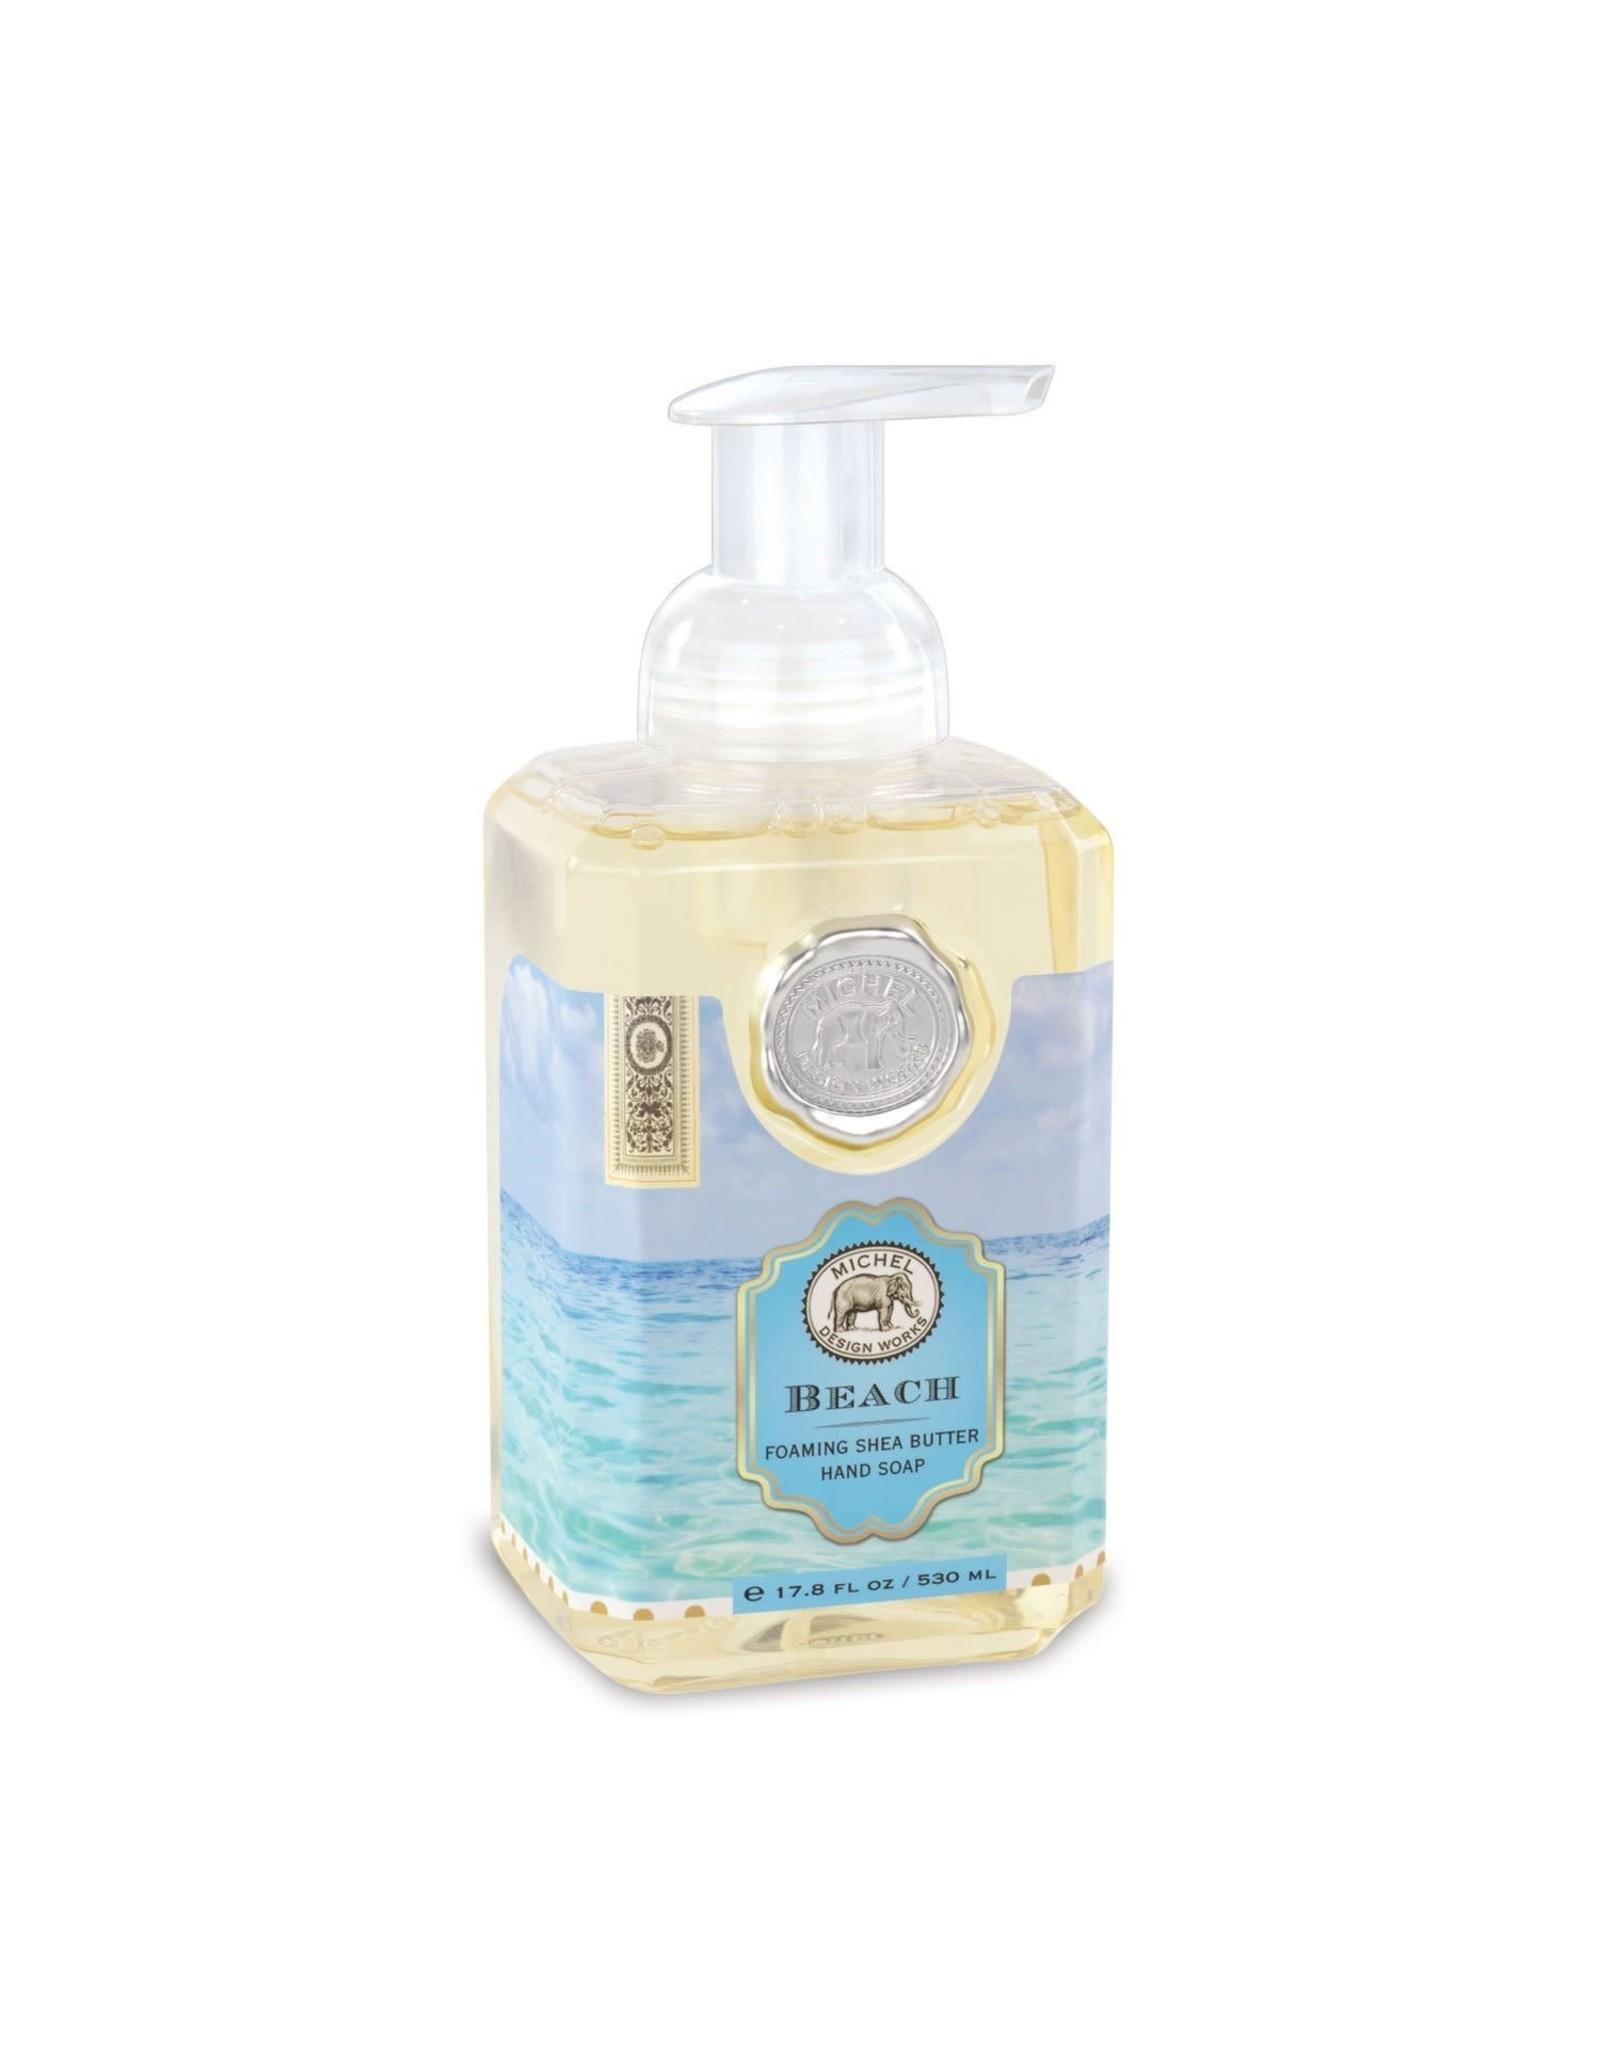 Michel Design Foaming Hand Soap, Beach, 4.7oz